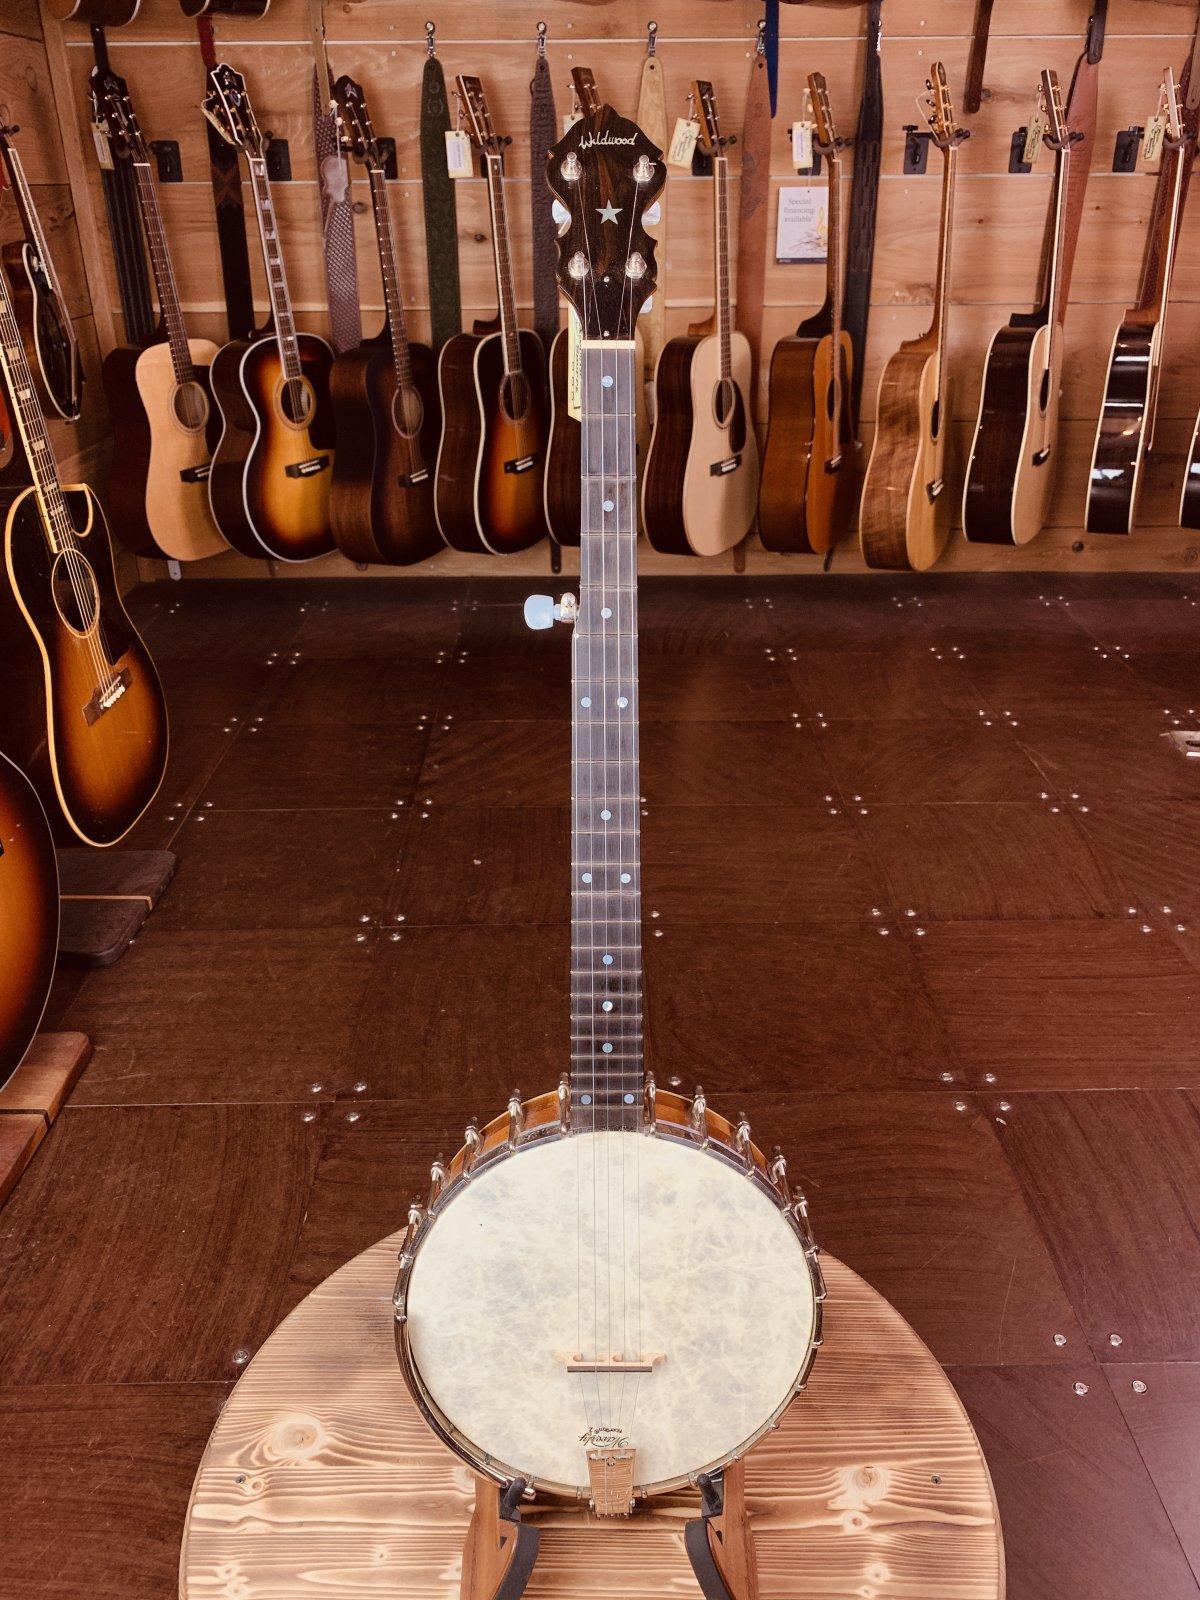 (Used) Wildwood Minstrel Open-Back 5-String Banjo